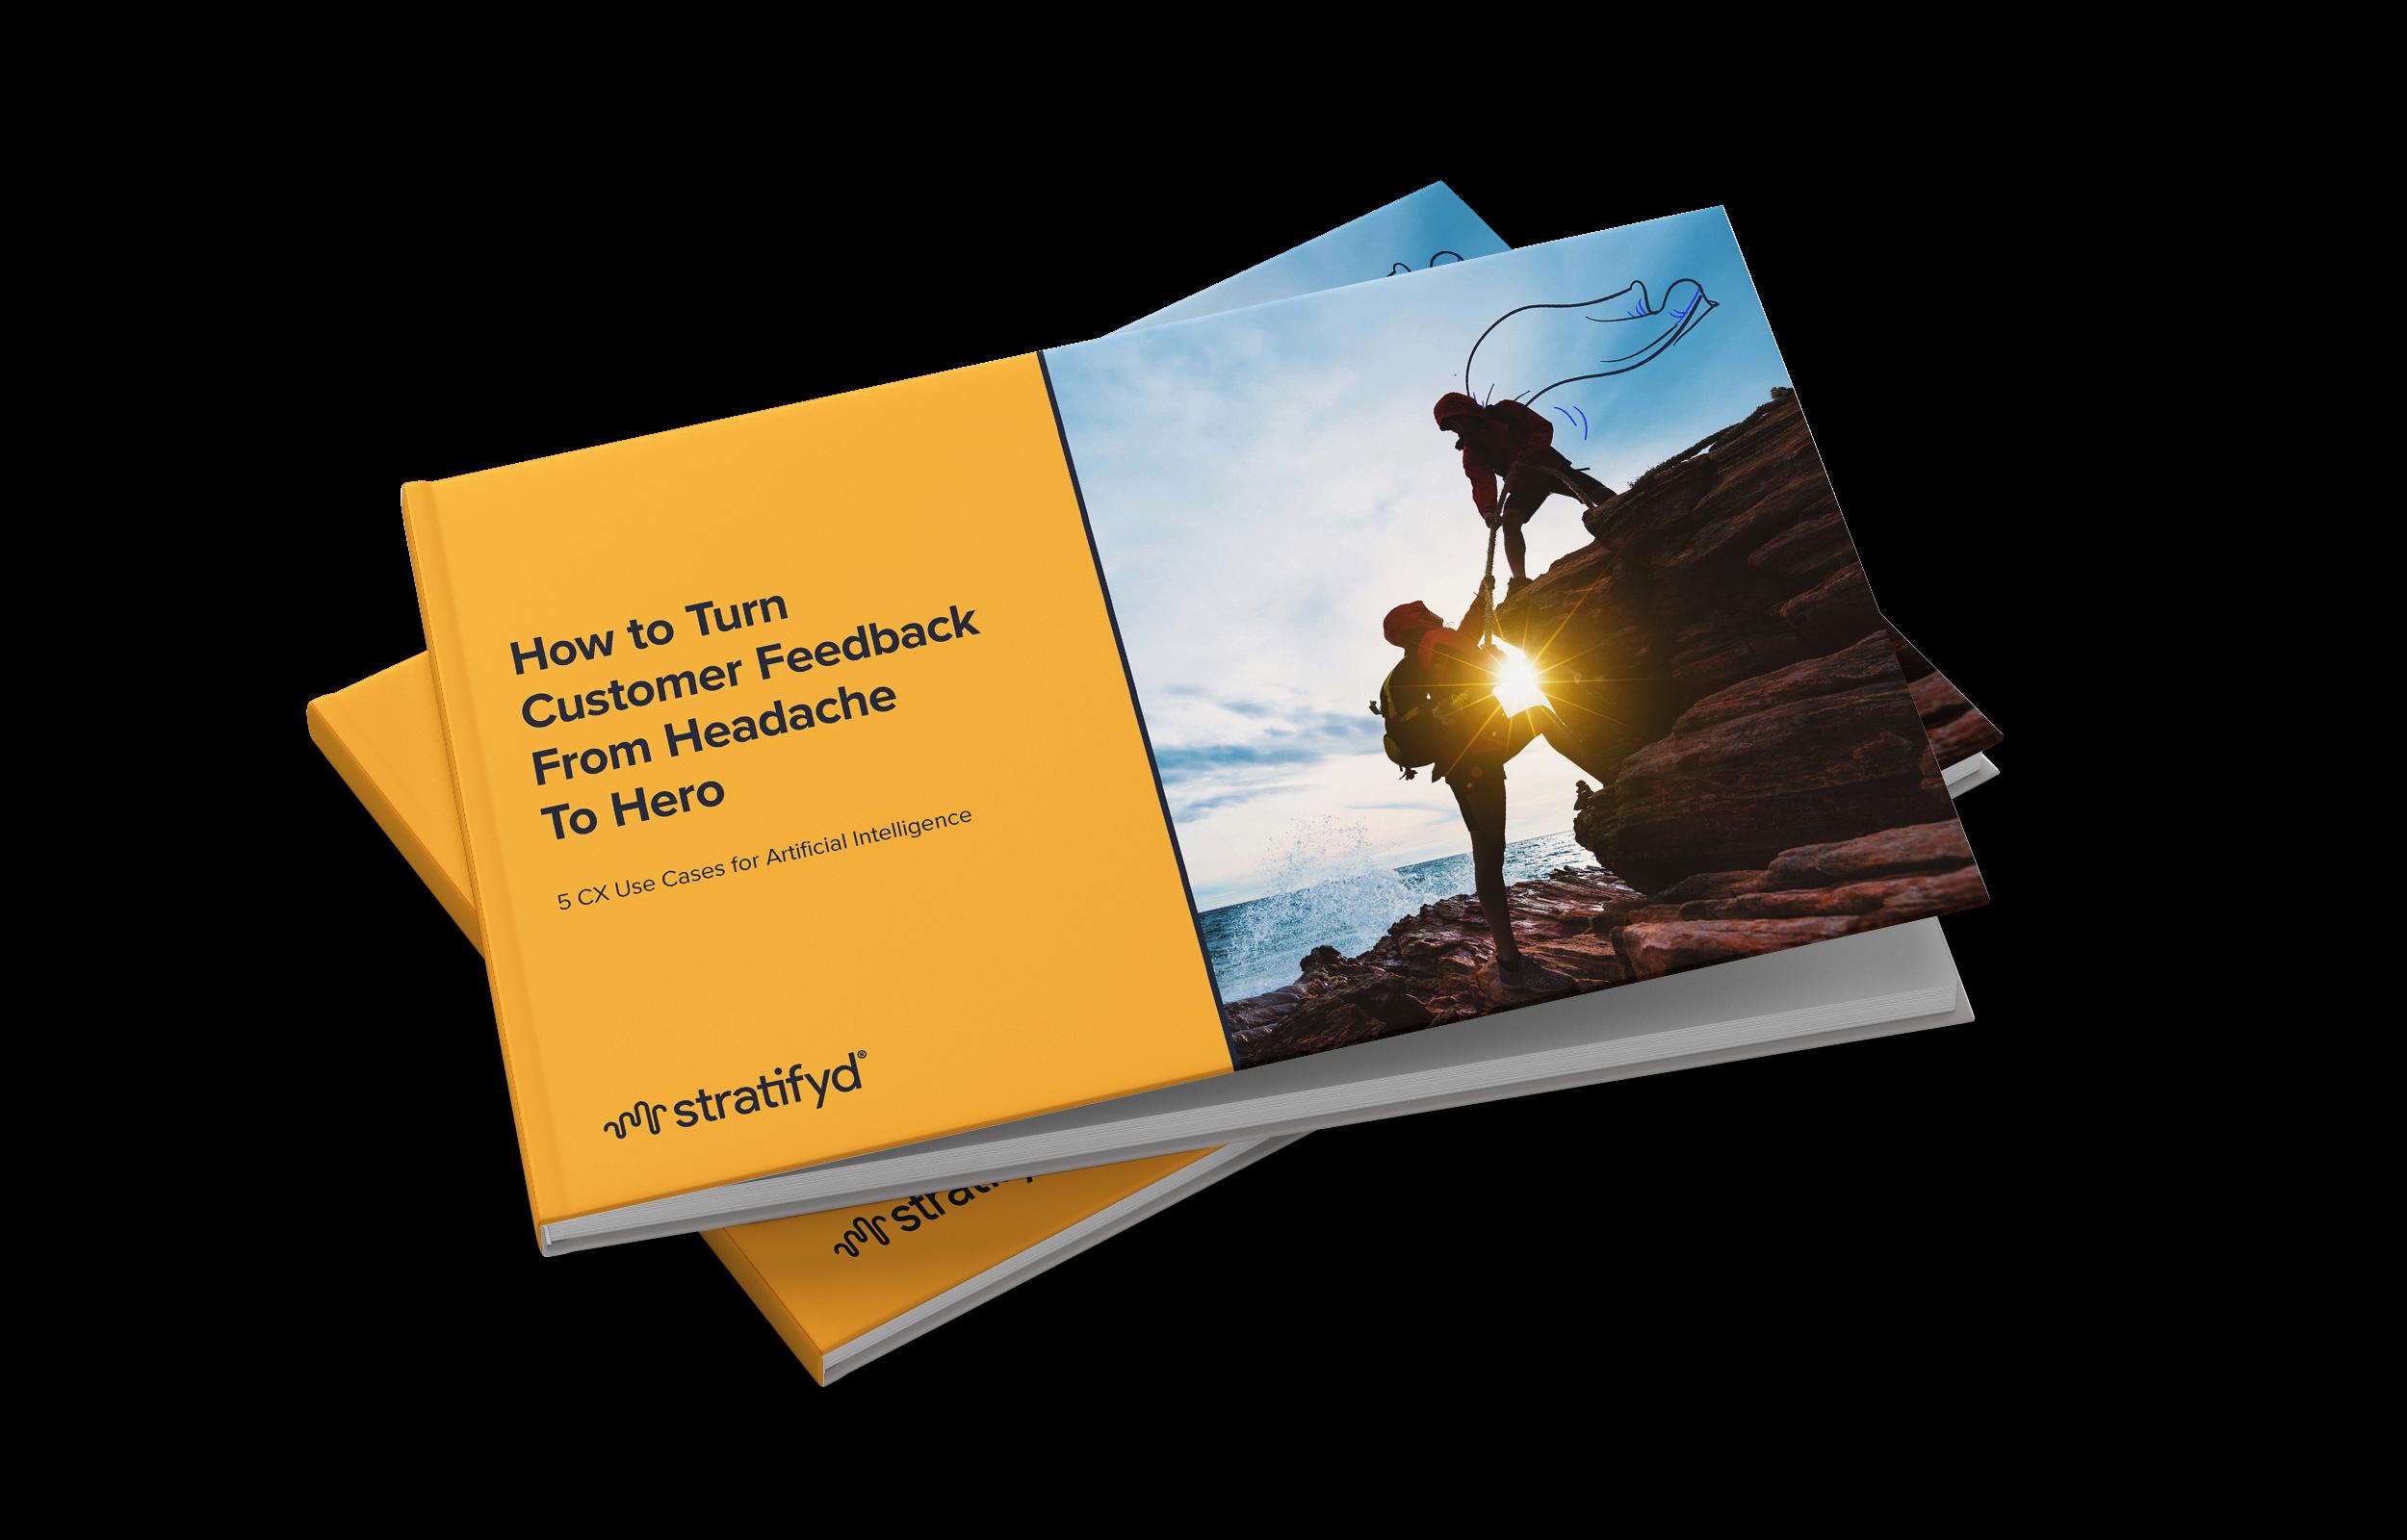 How to Turn Customer Feedback from Headache to Hero